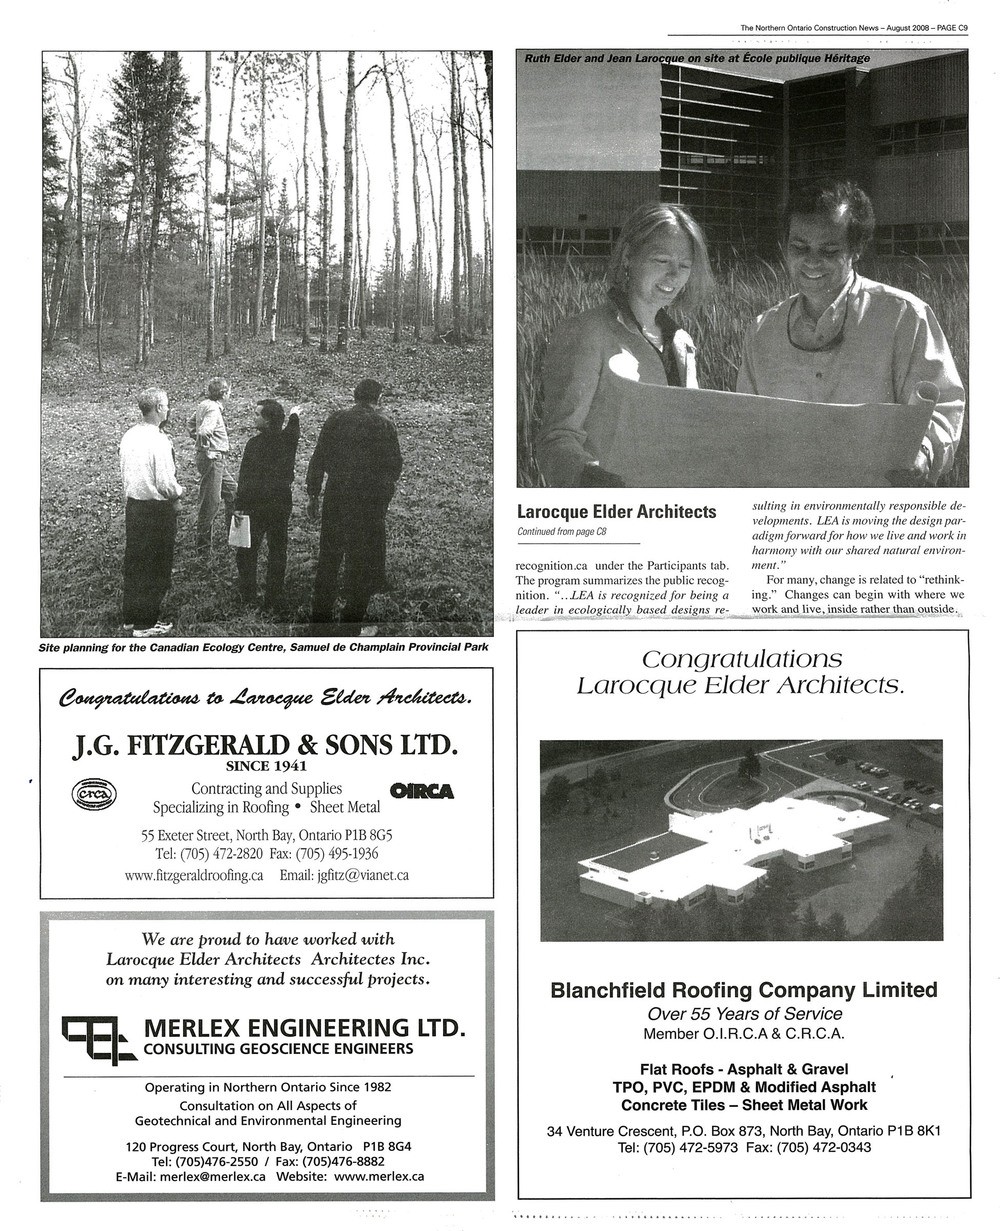 NOCN_Aug2008_Page_3.jpg